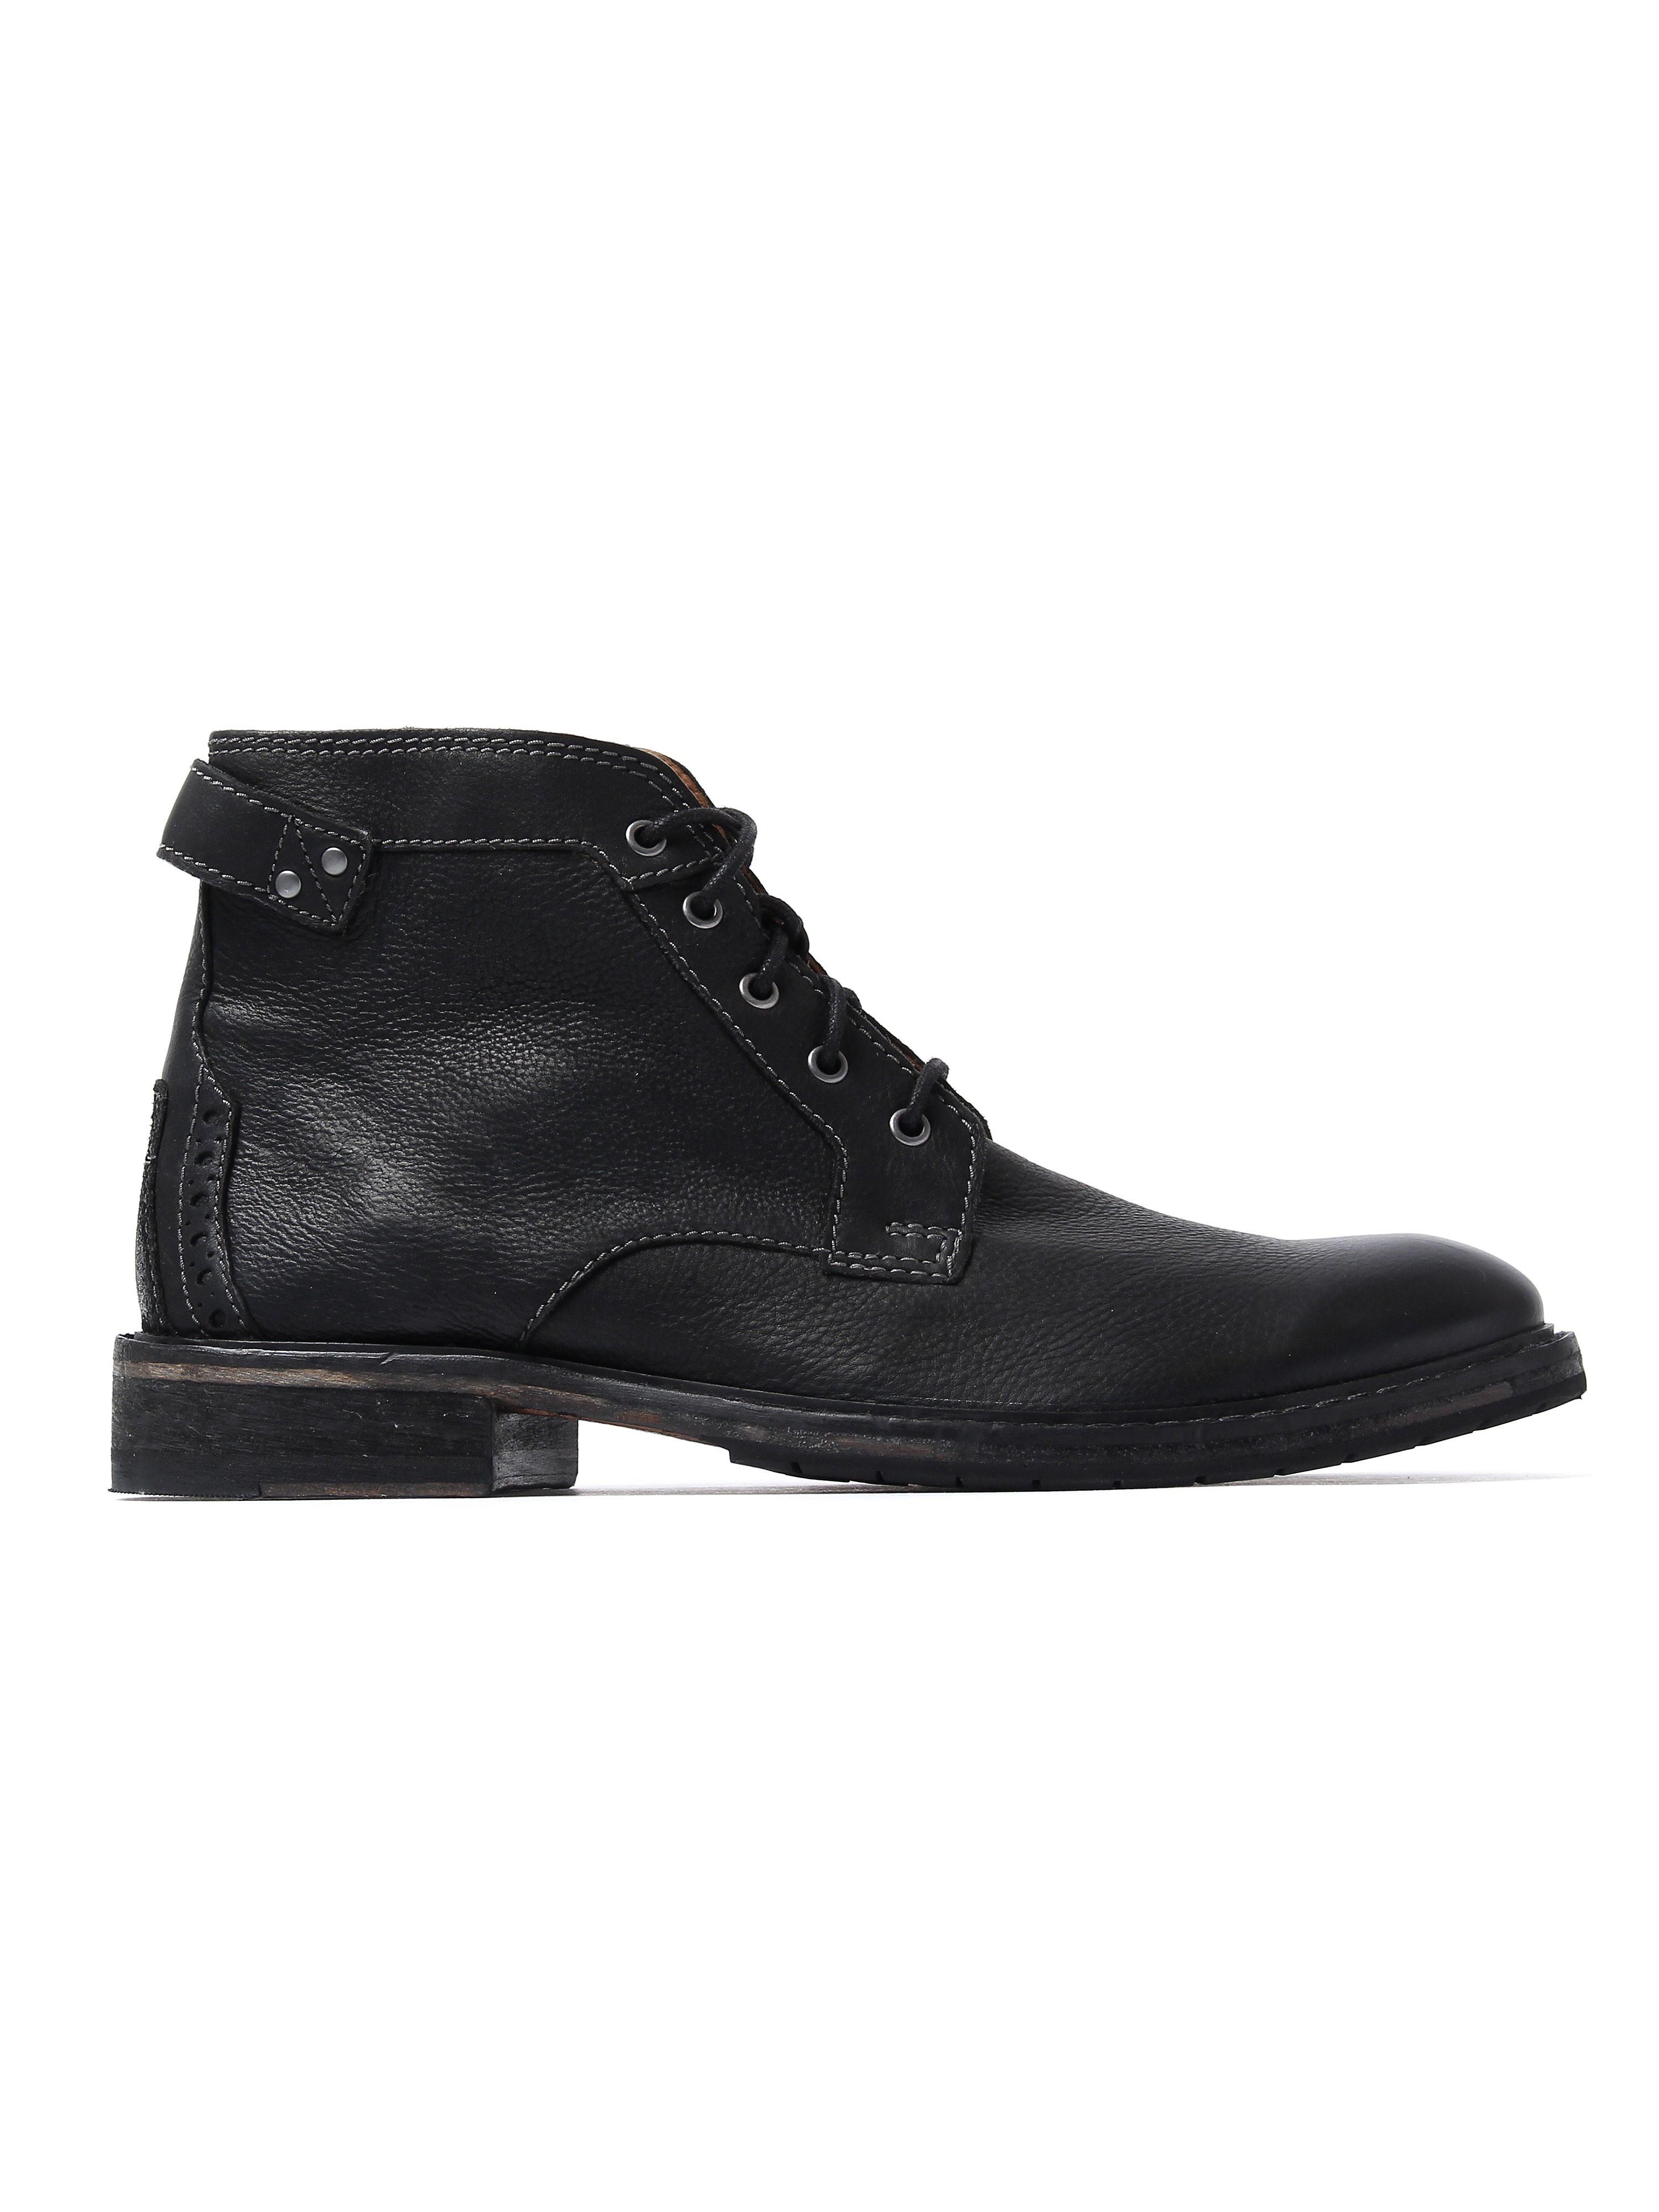 Clarks Men's Clarkdale Bud Boots - Black Leather